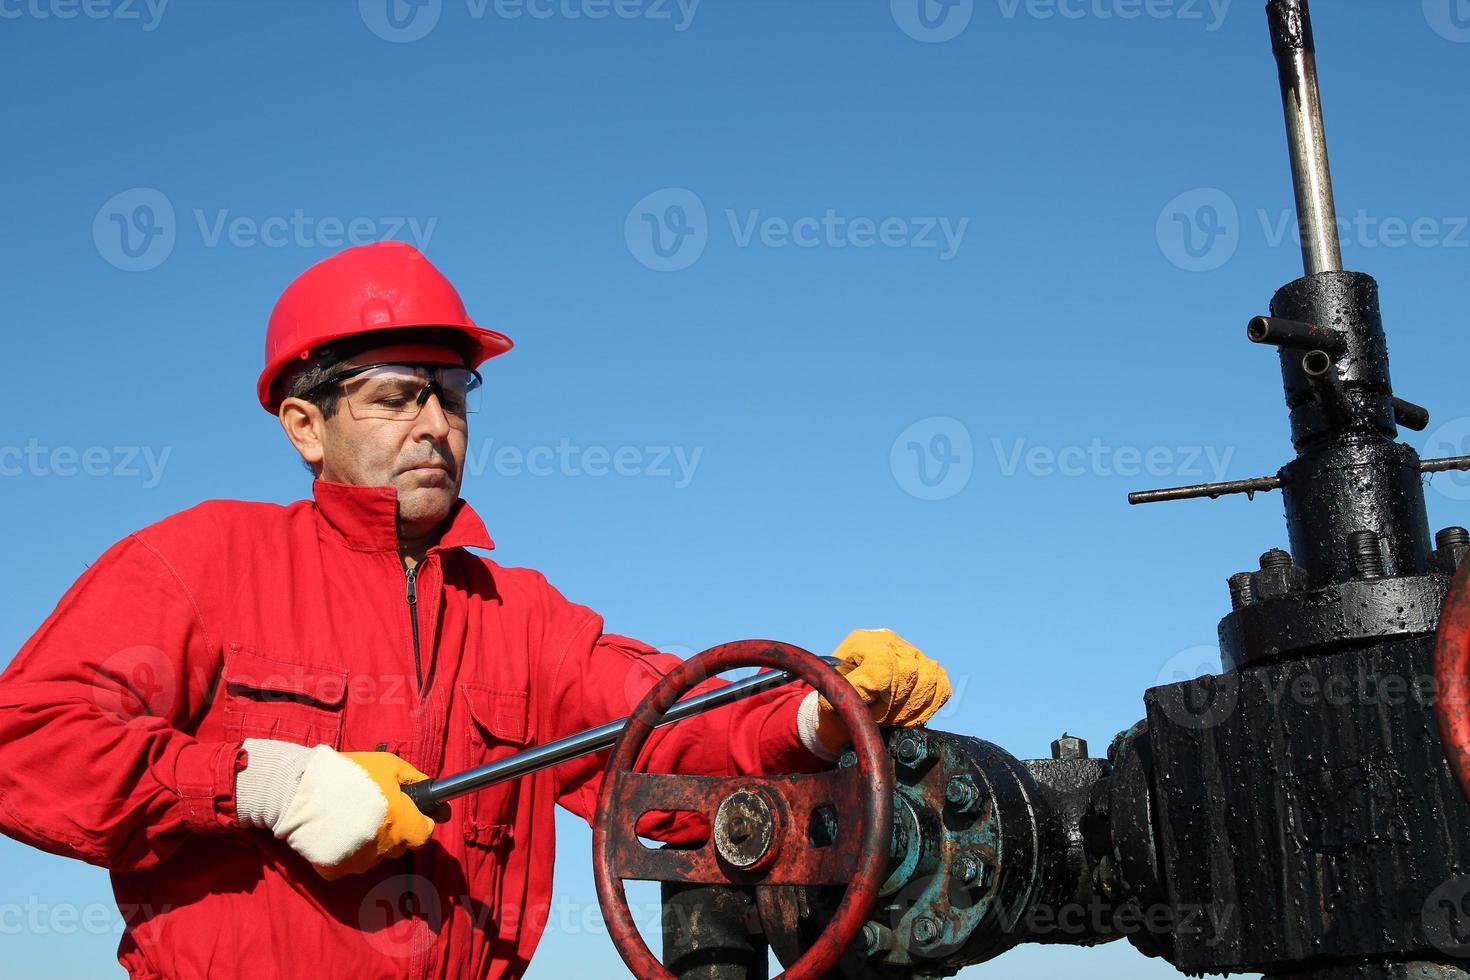 oljetappventiltekniker på jobbet foto